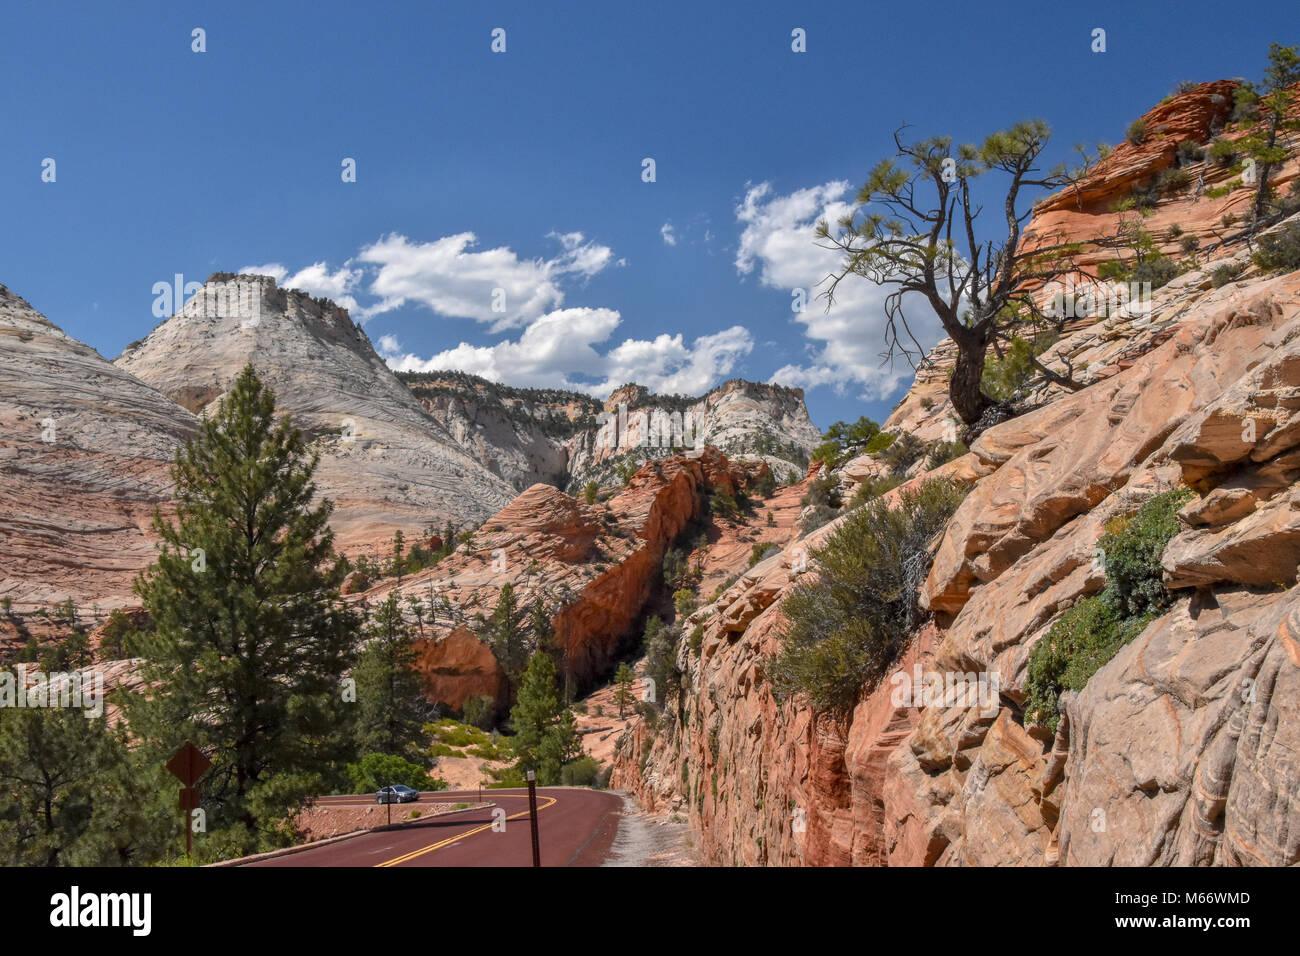 Zion National Park has 289 species of birds,75 mammals ( including 19 species of bats),32 retiles inhabiting the - Stock Image